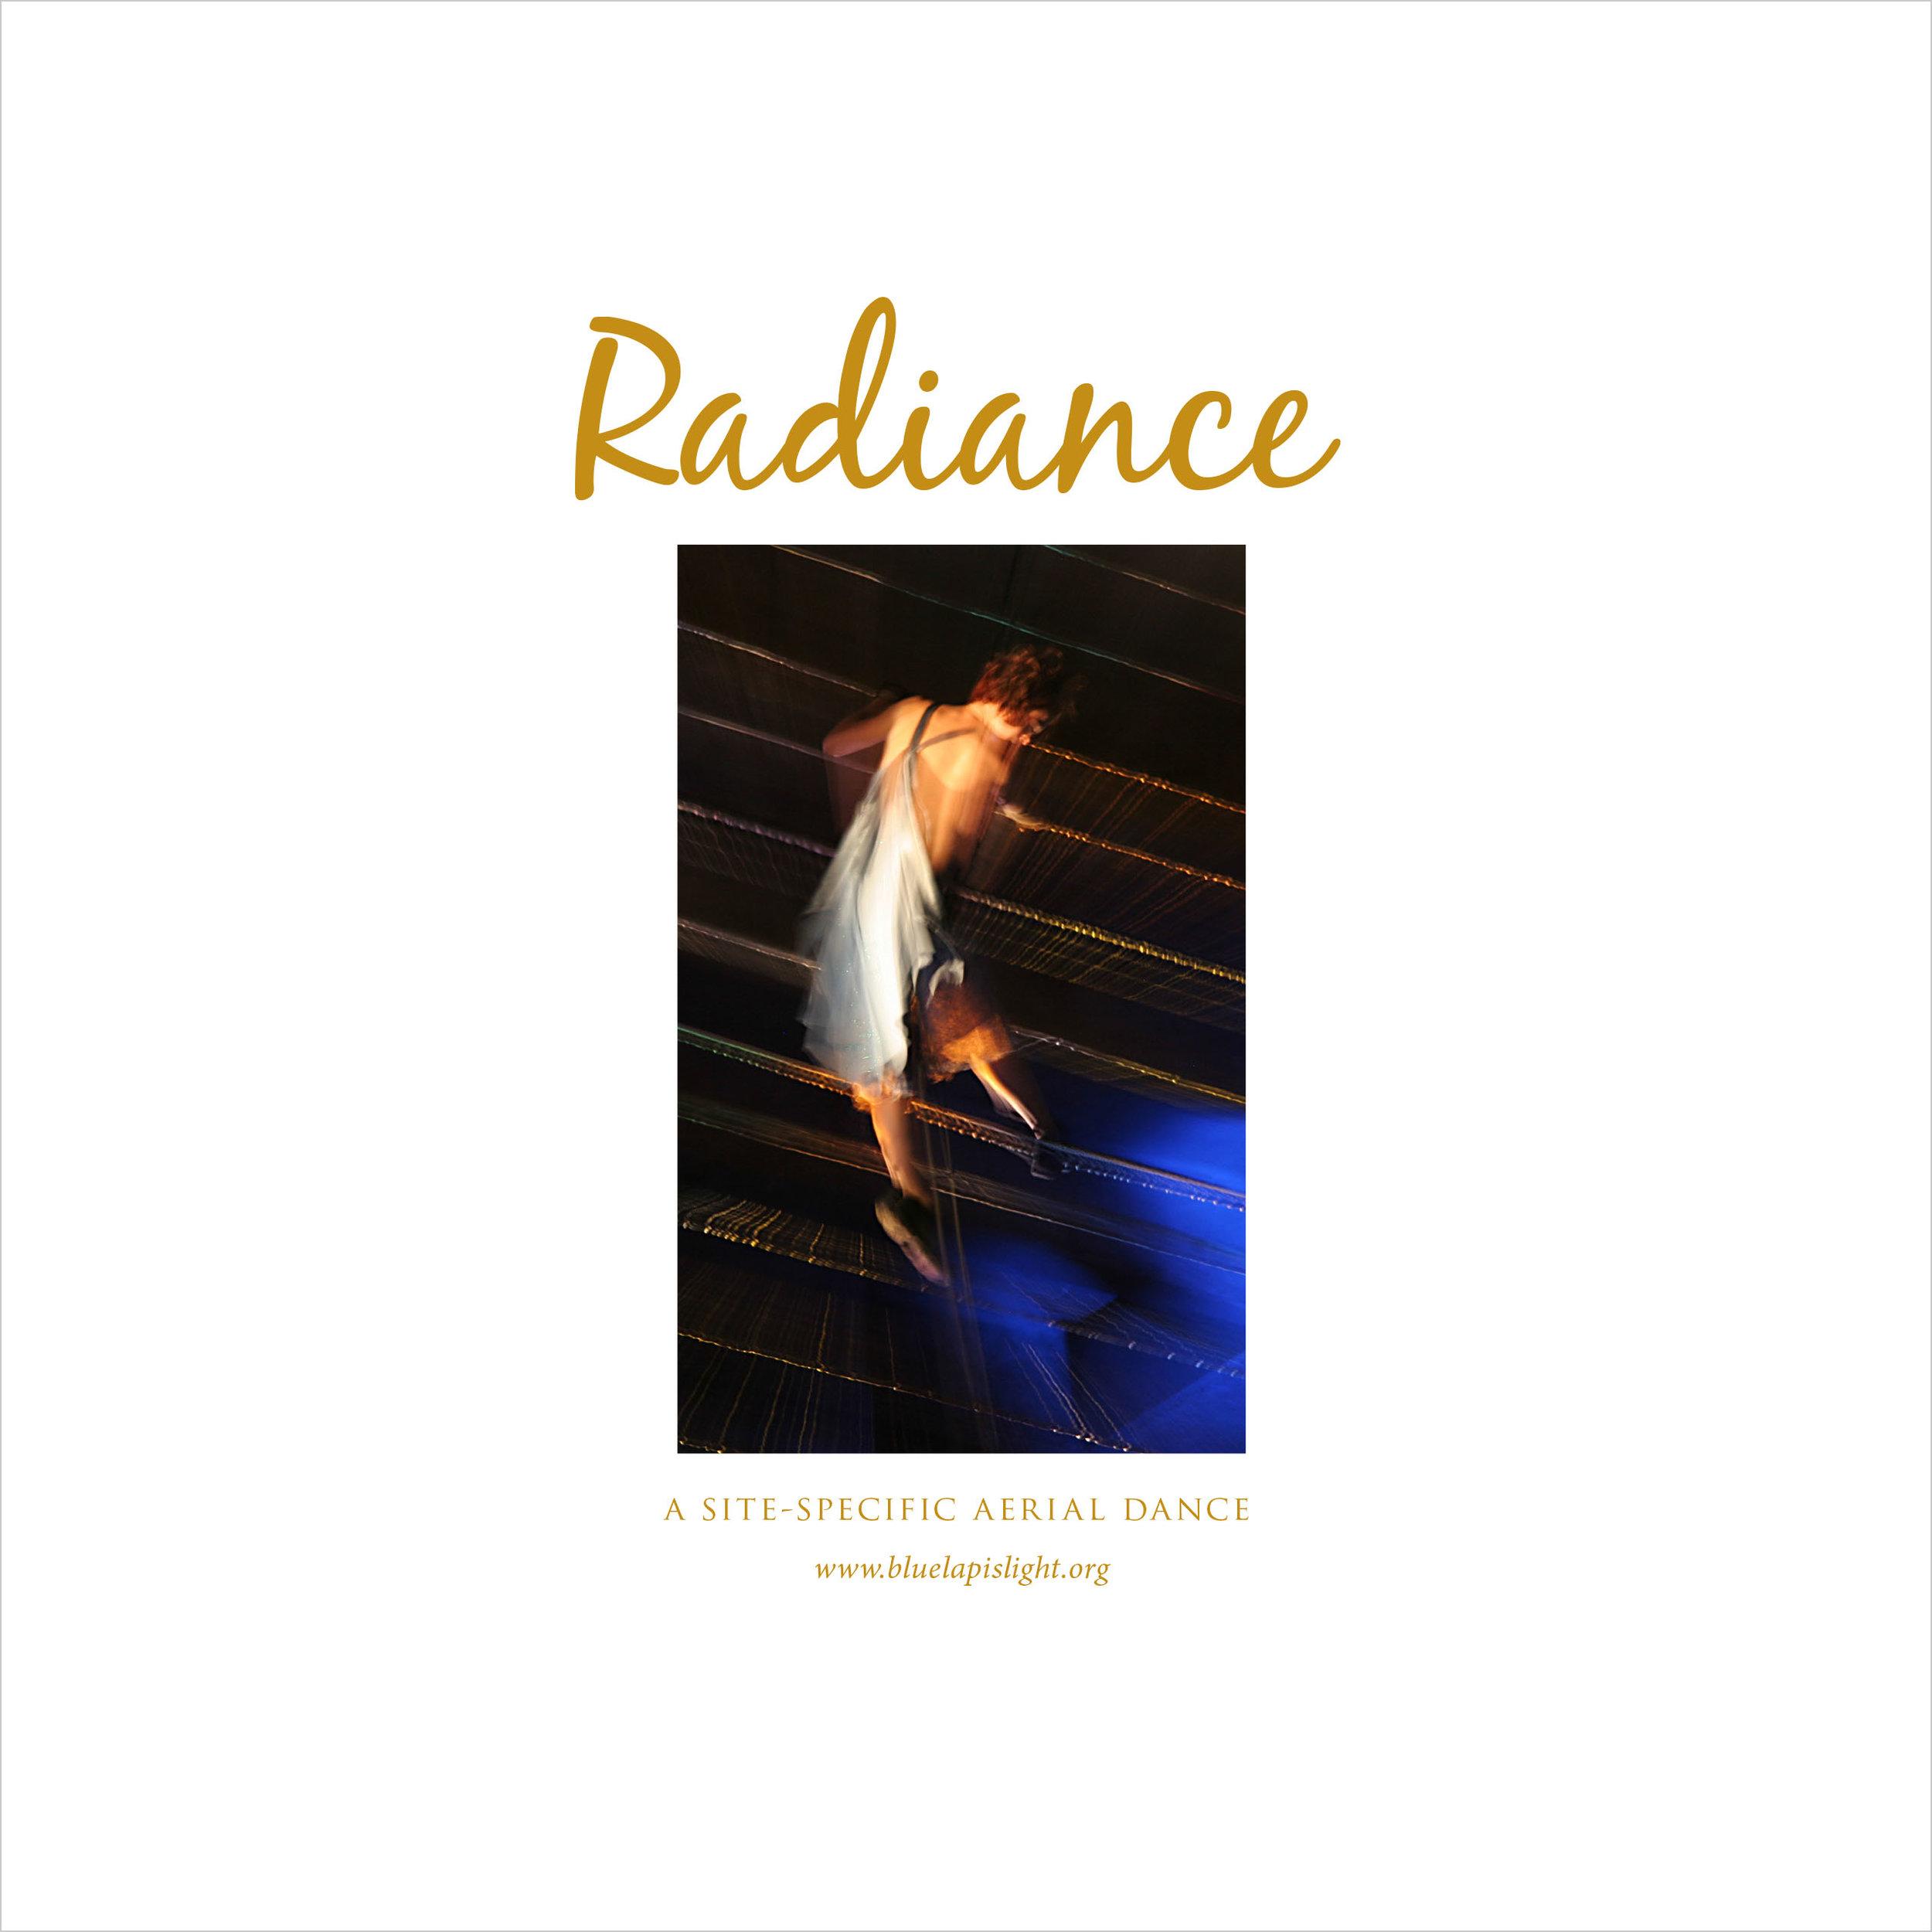 160606_Radiance_Program_v13-FINAL-1-stroke3.jpg